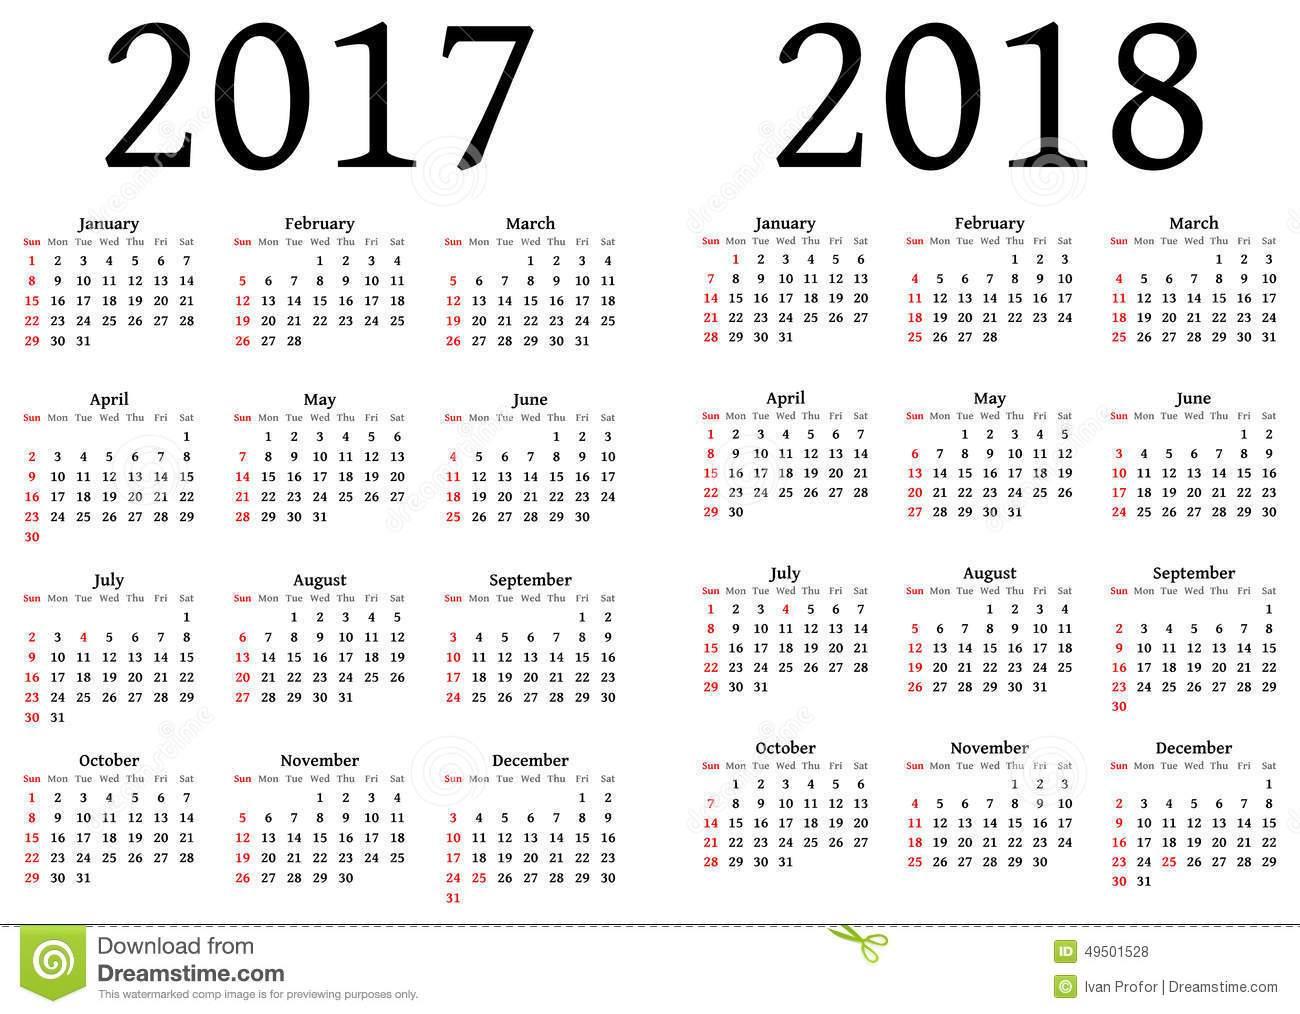 2018 julian calendar printable Toreto.co